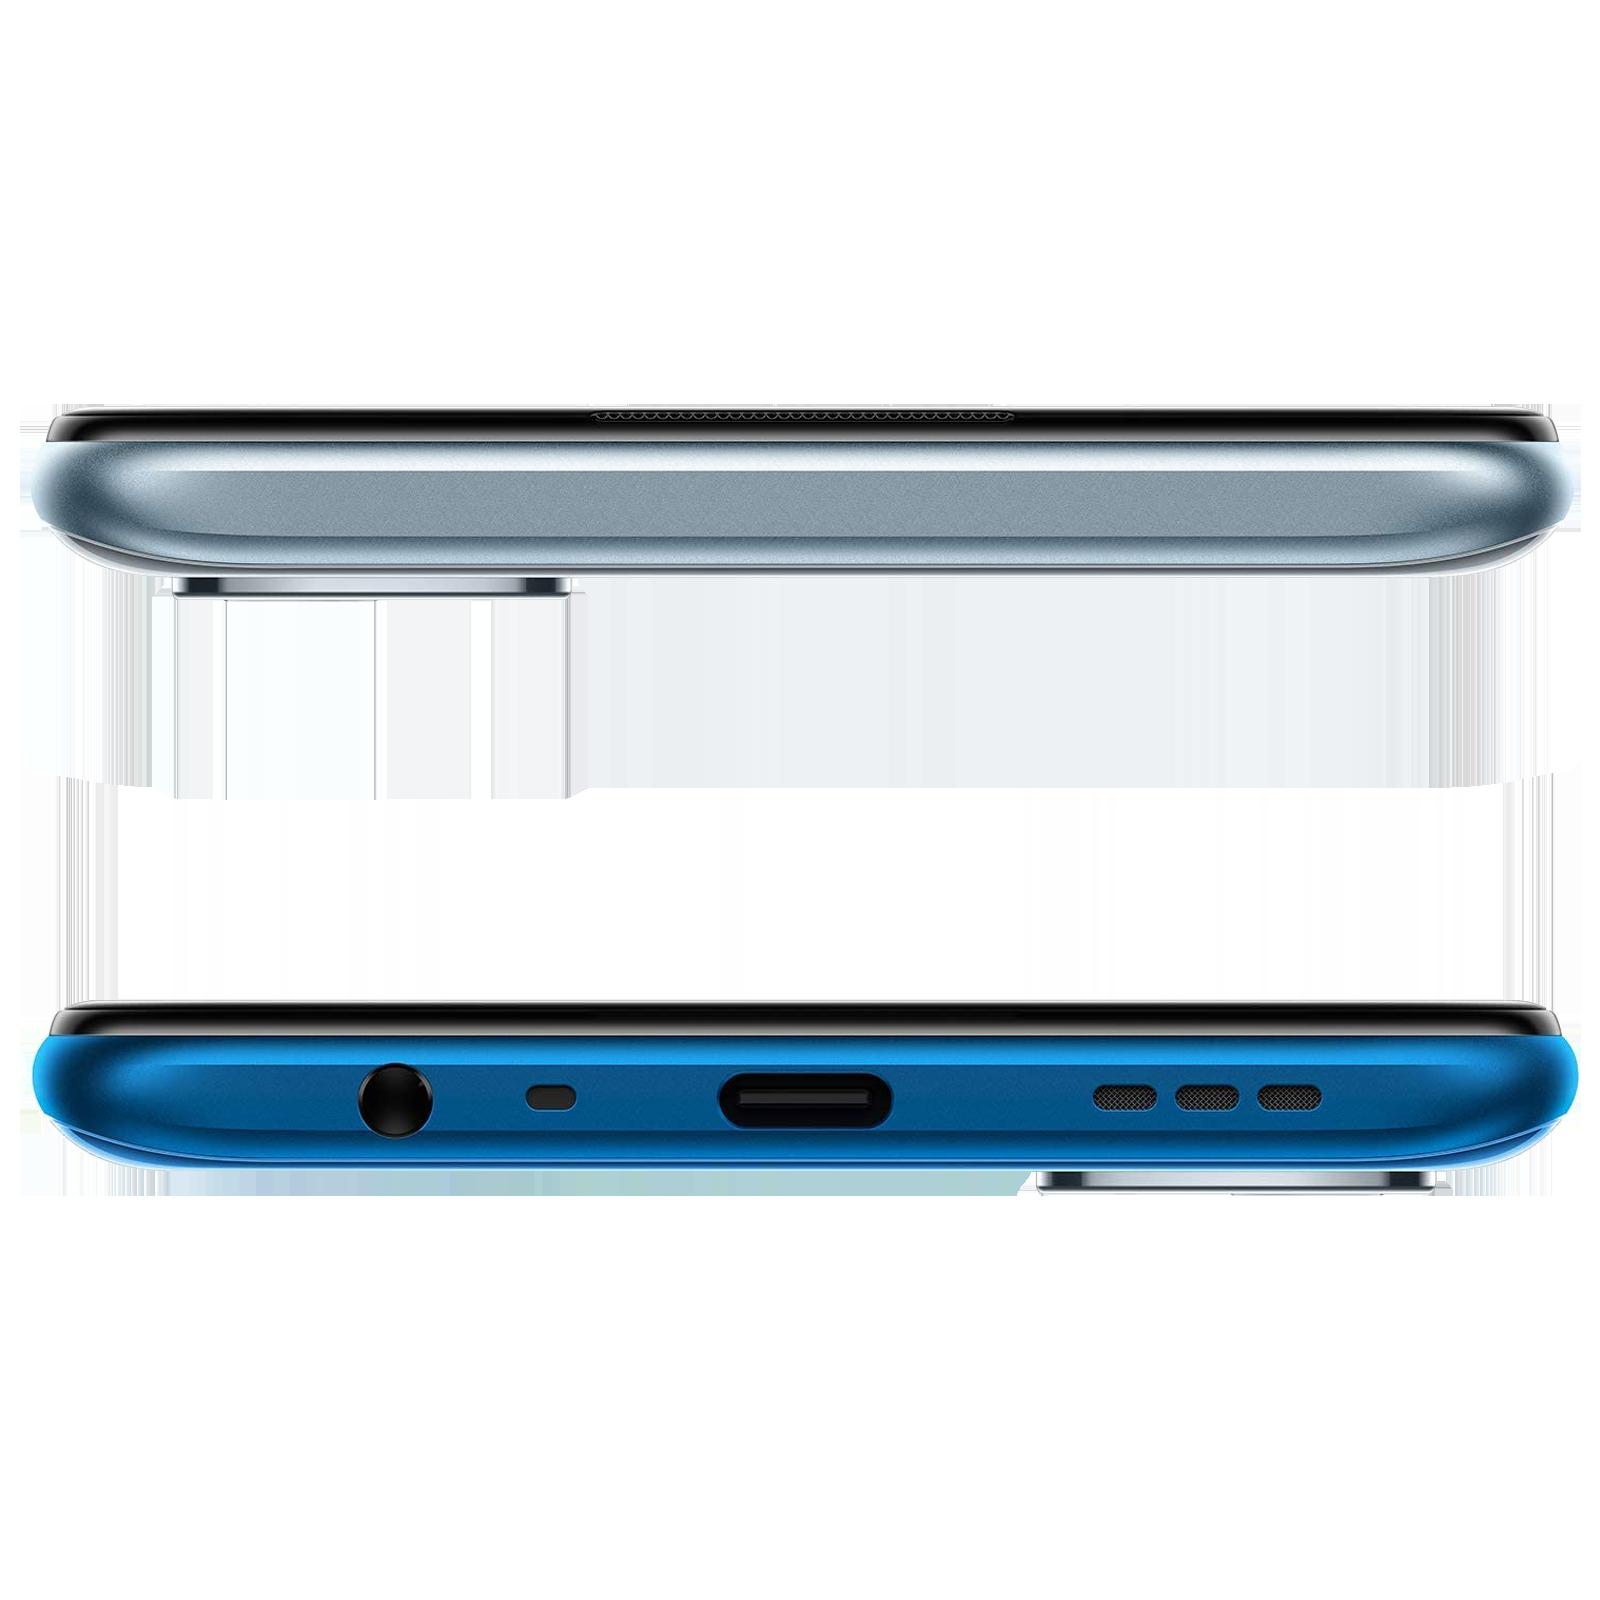 Oppo A53s (128GB ROM, 8GB RAM, CPH2321, Crystal Blue) 6